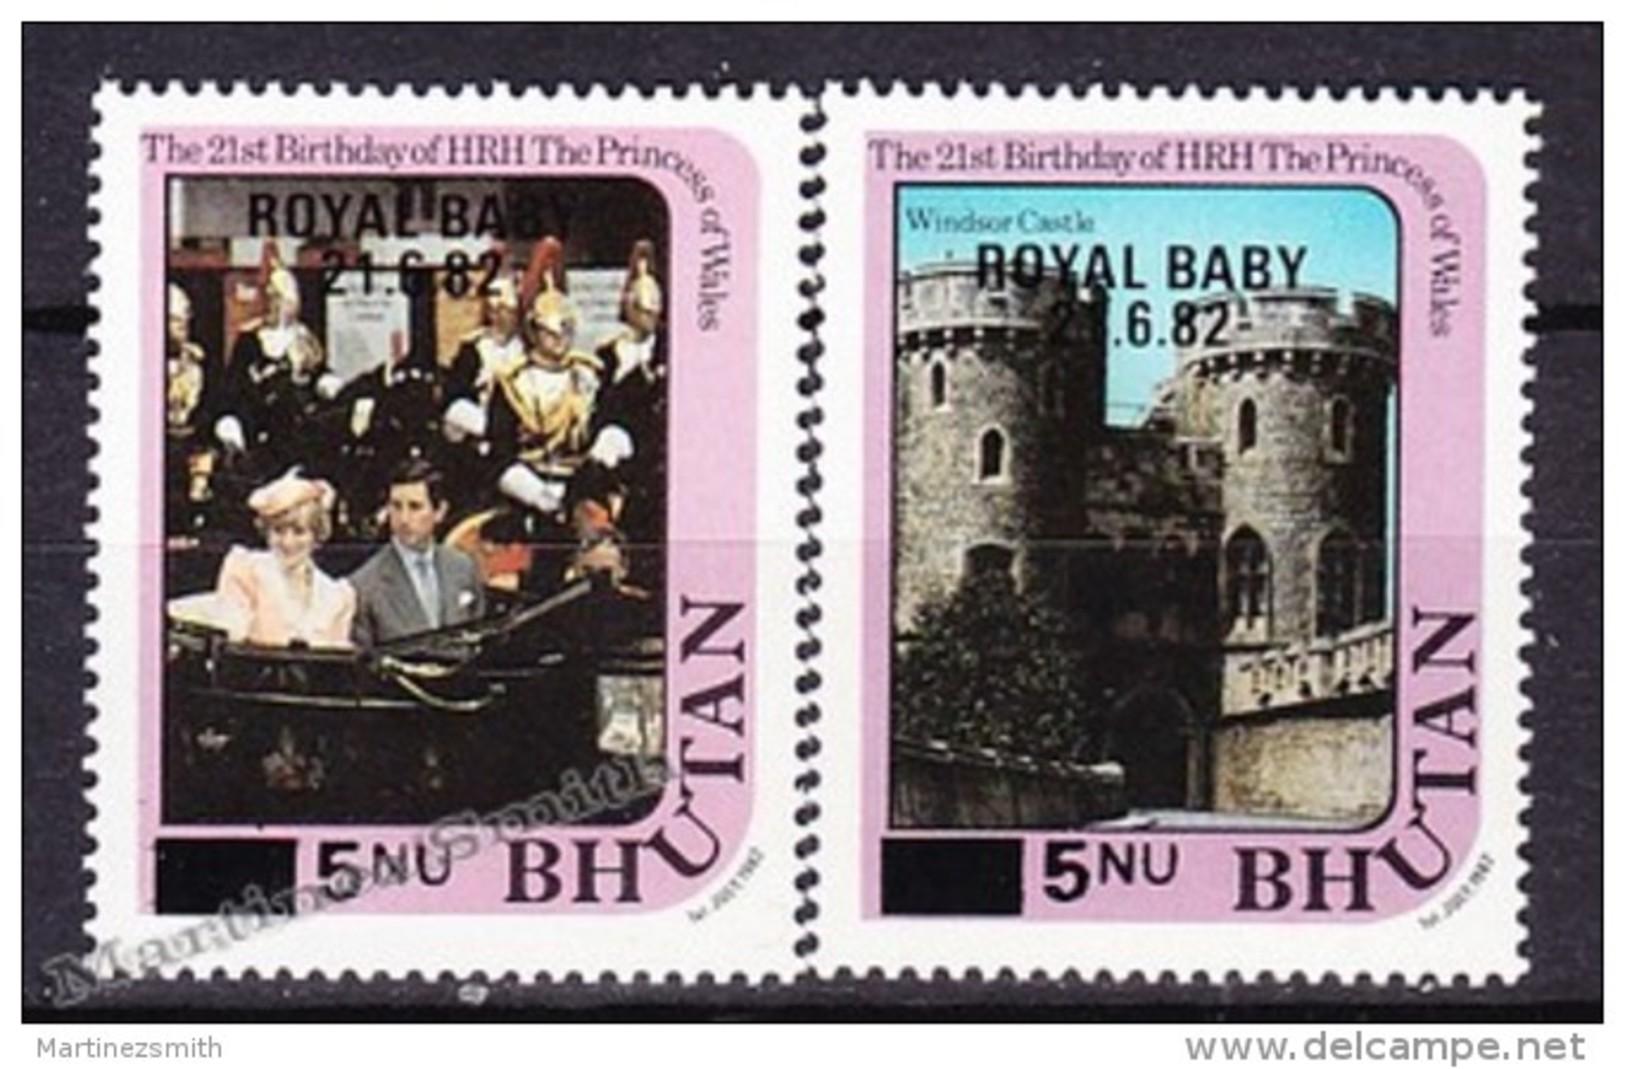 Bhutan - Bhoutan 1982 Yvert 589- 90, 21th Birthday Of HRH The Princess Of Wales - Royal Baby Overprint - MNH - Bhoutan